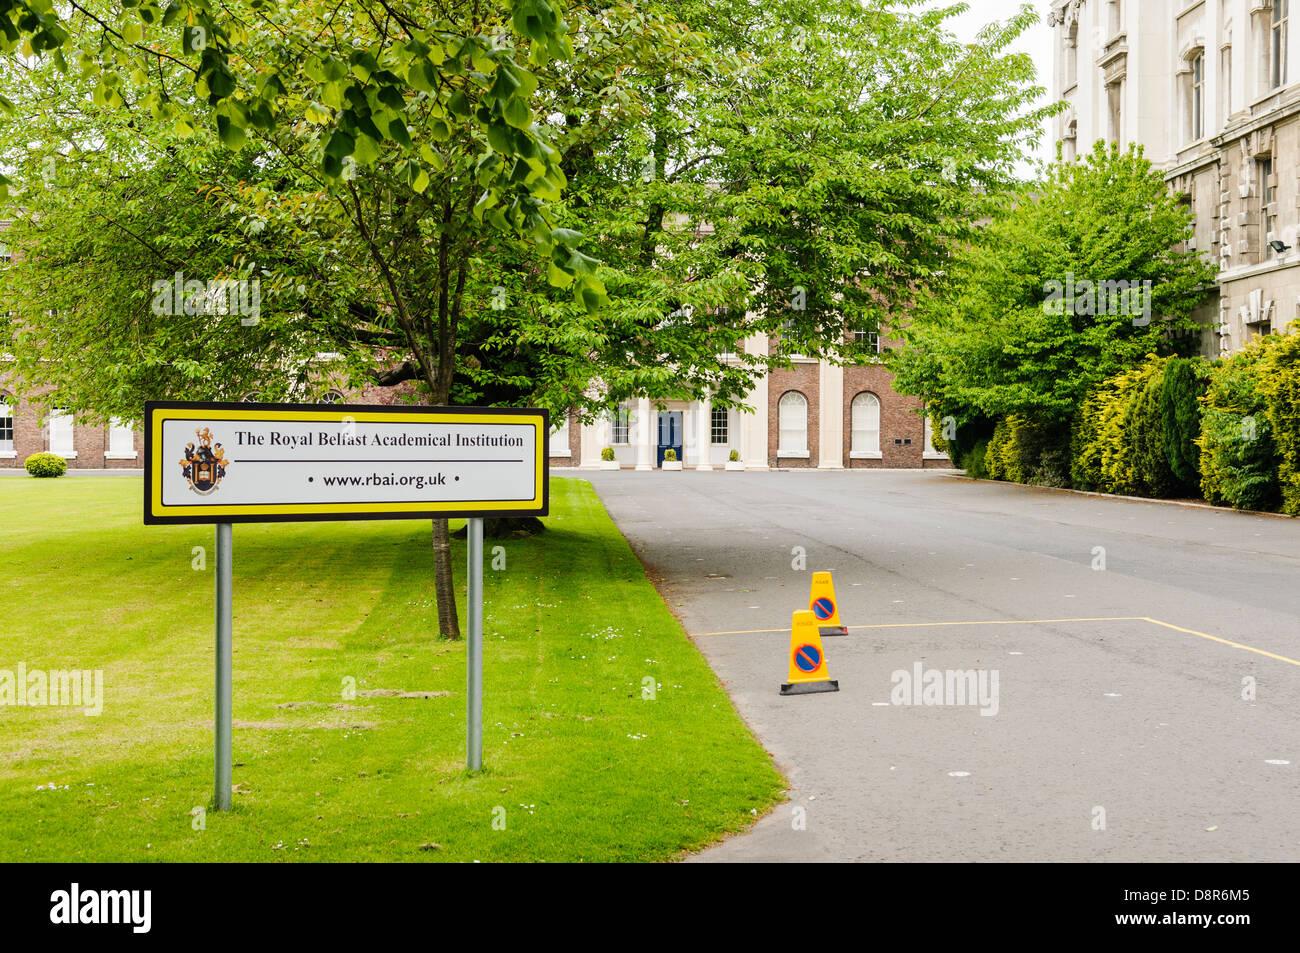 Royal Belfast Academical Institution (Inst), a boy's Grammar School in Belfast. - Stock Image